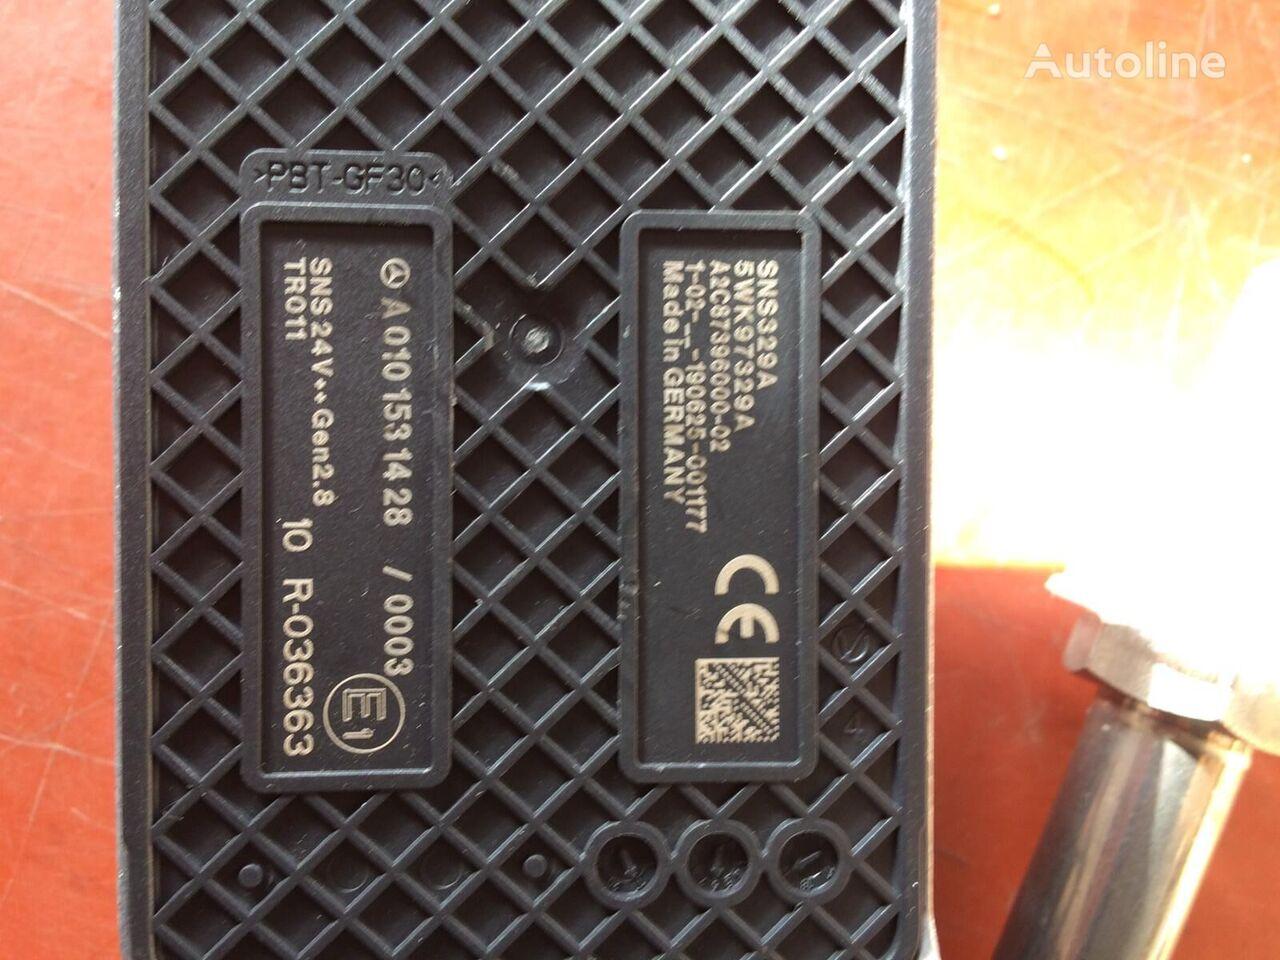 new MERCEDES-BENZ NOX sensor for MERCEDES-BENZ ACTROS MP 4 commercial vehicle